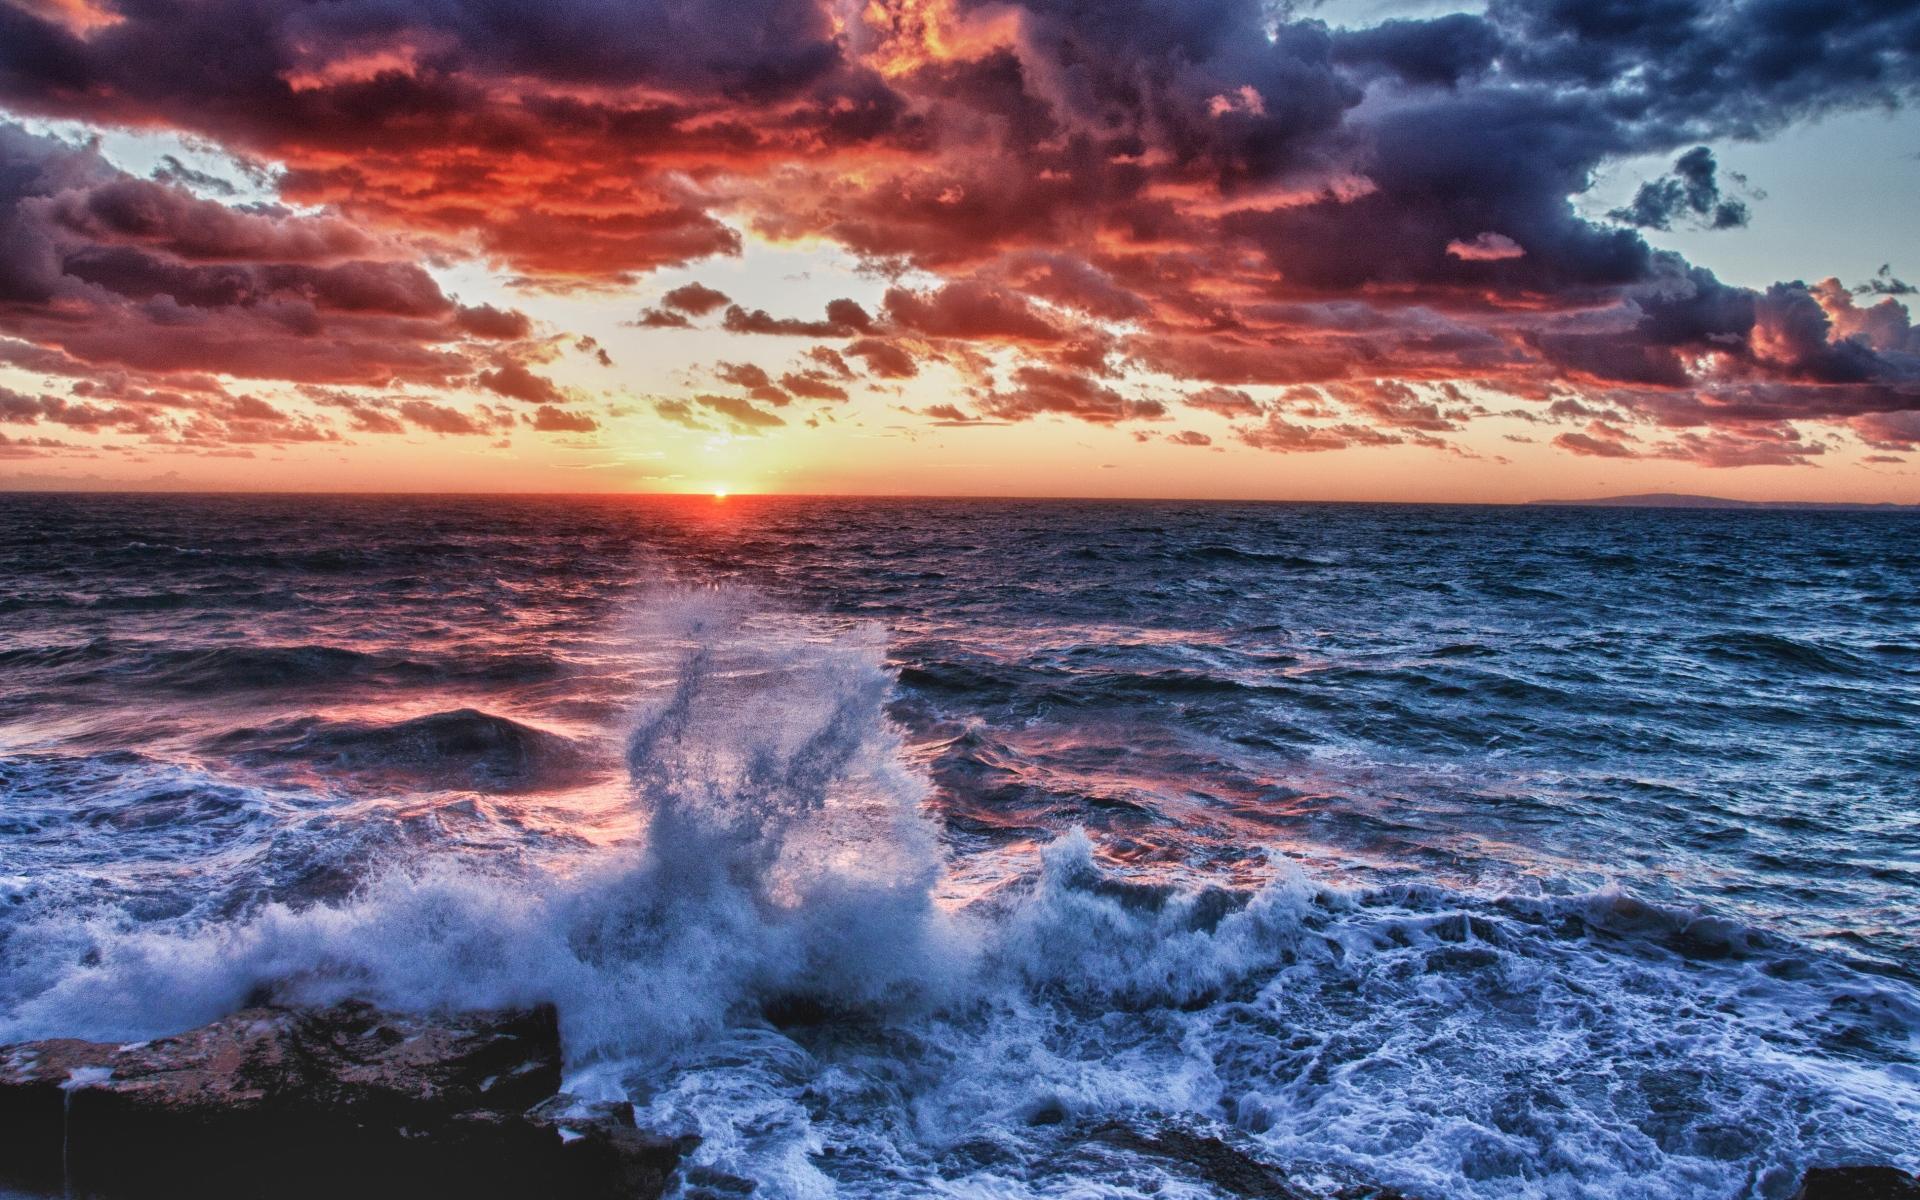 Картинки Волна, море, брызги, закат, вечер, сумерки, тени, цвета фото и обои на рабочий стол